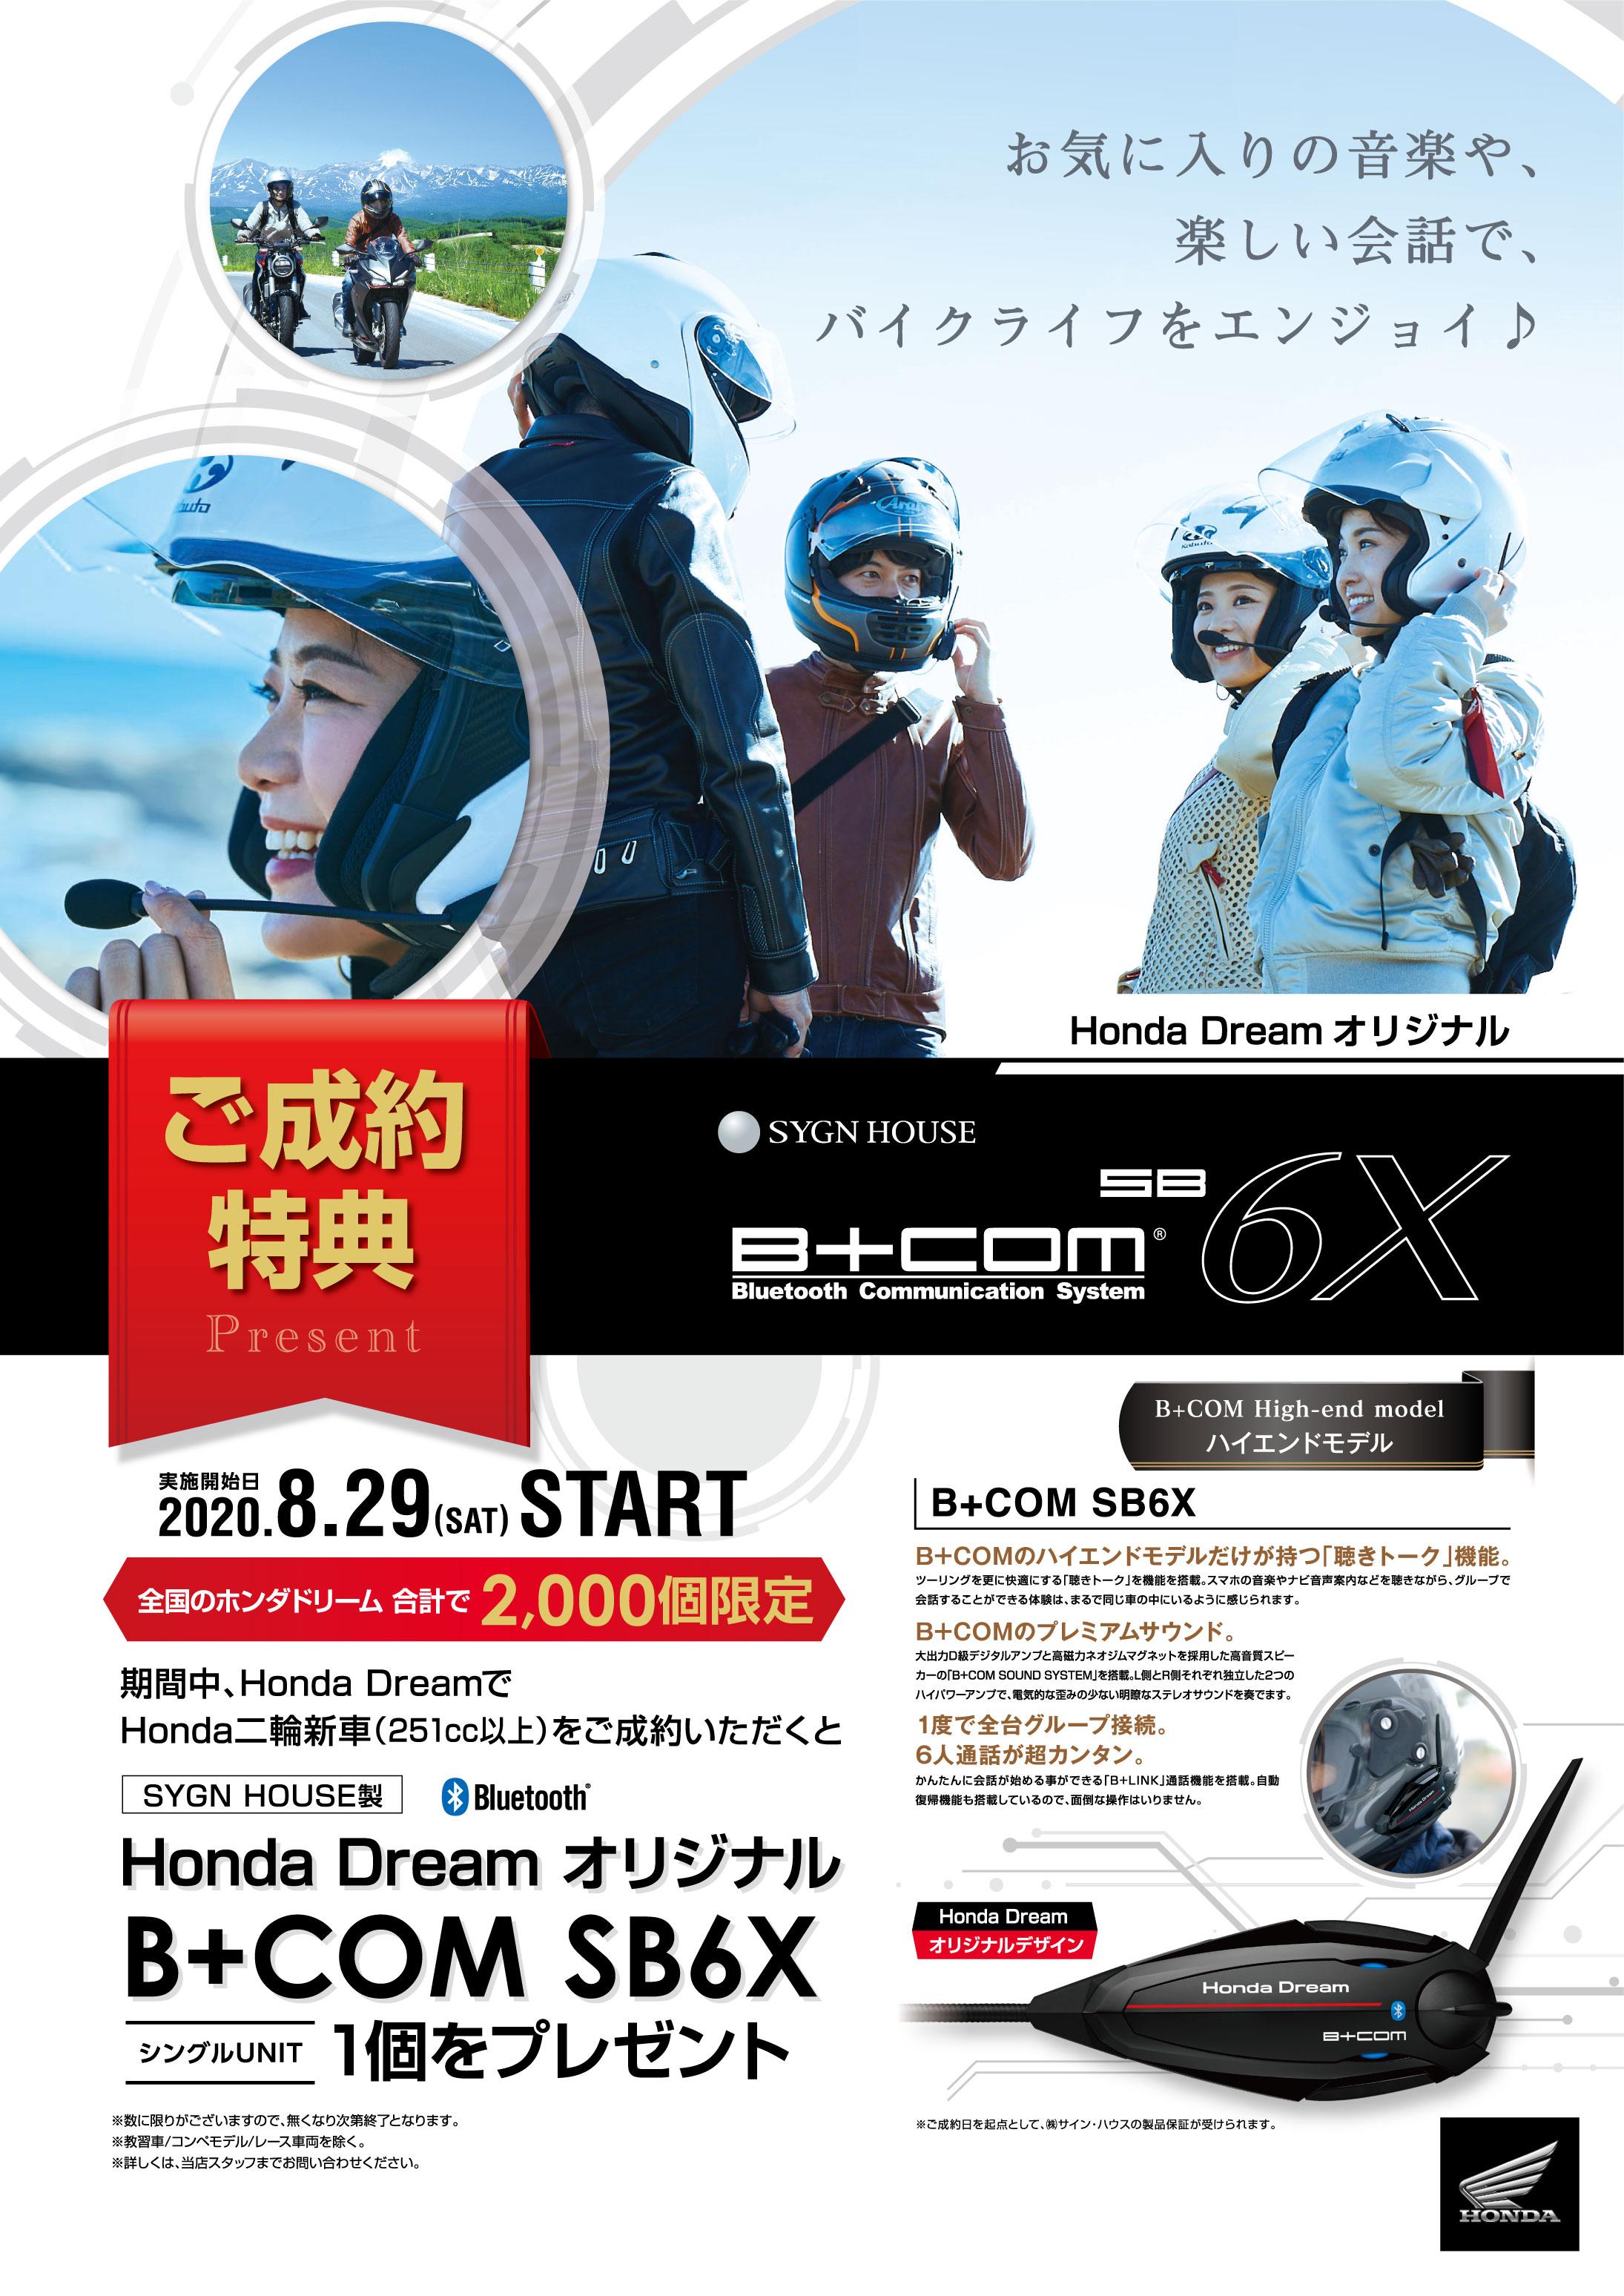 Honda DreamオリジナルB+COM SB6Xプレゼントキャンペーン